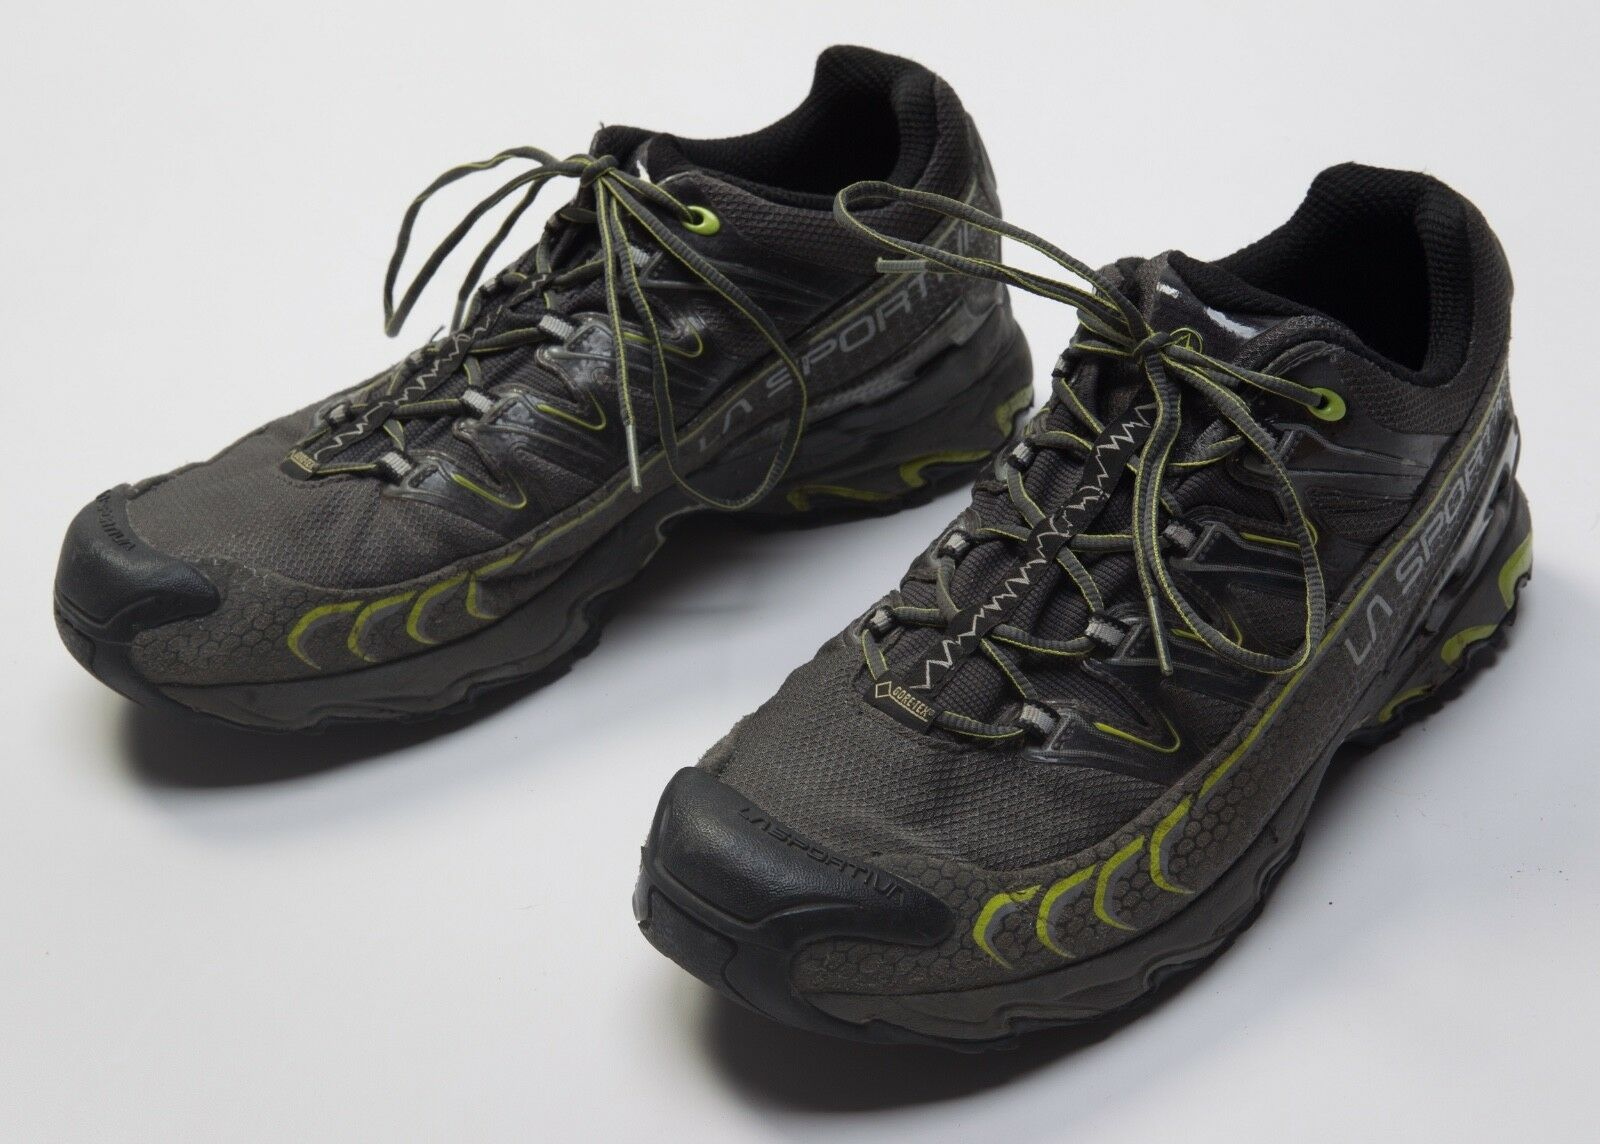 männer - la sportiva ultra - größe trail is laufschuhe wandern größe - sz uns 13,5 c33701